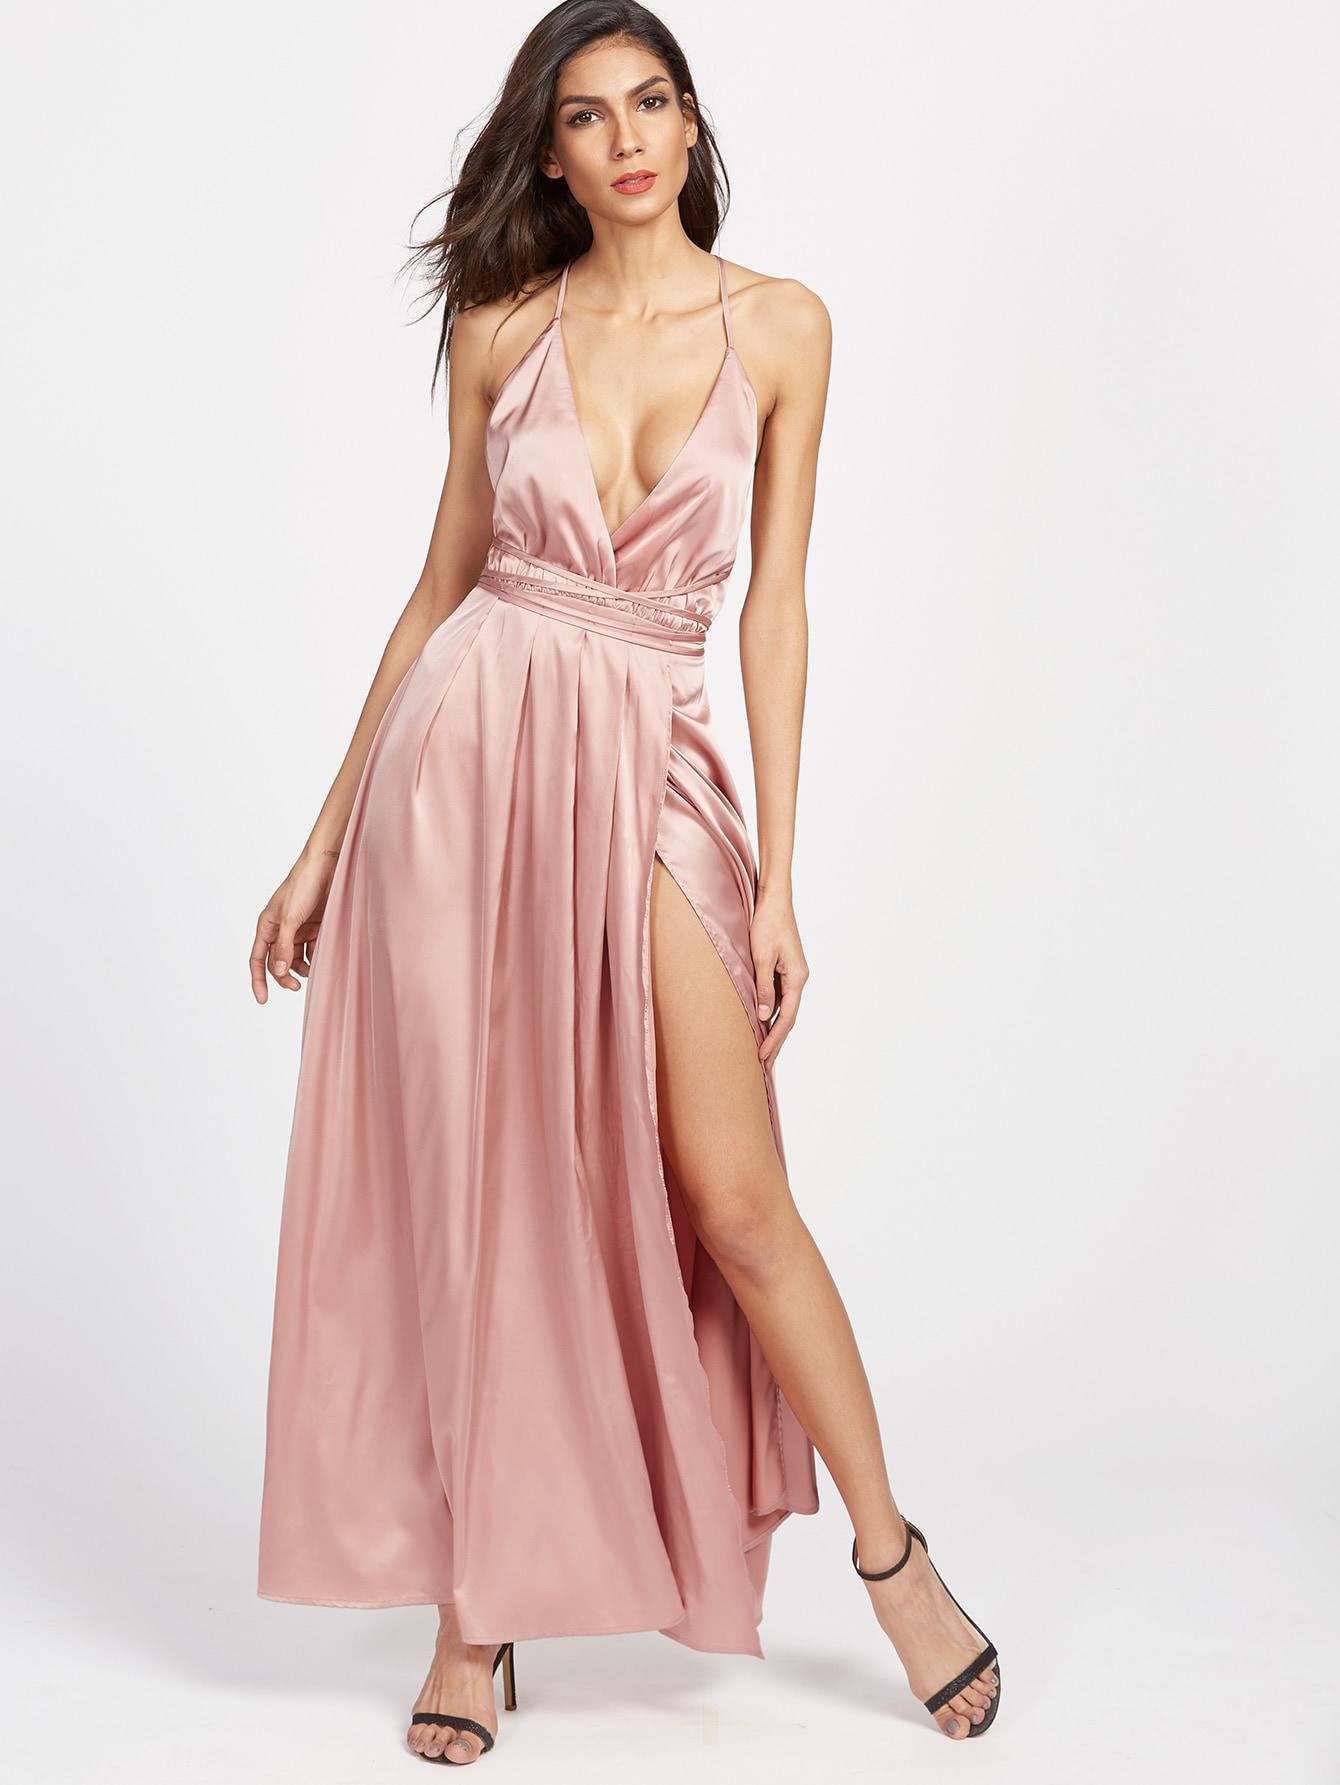 Plunging Surplice Front Crisscross High Slit Cami Dress цена 2017